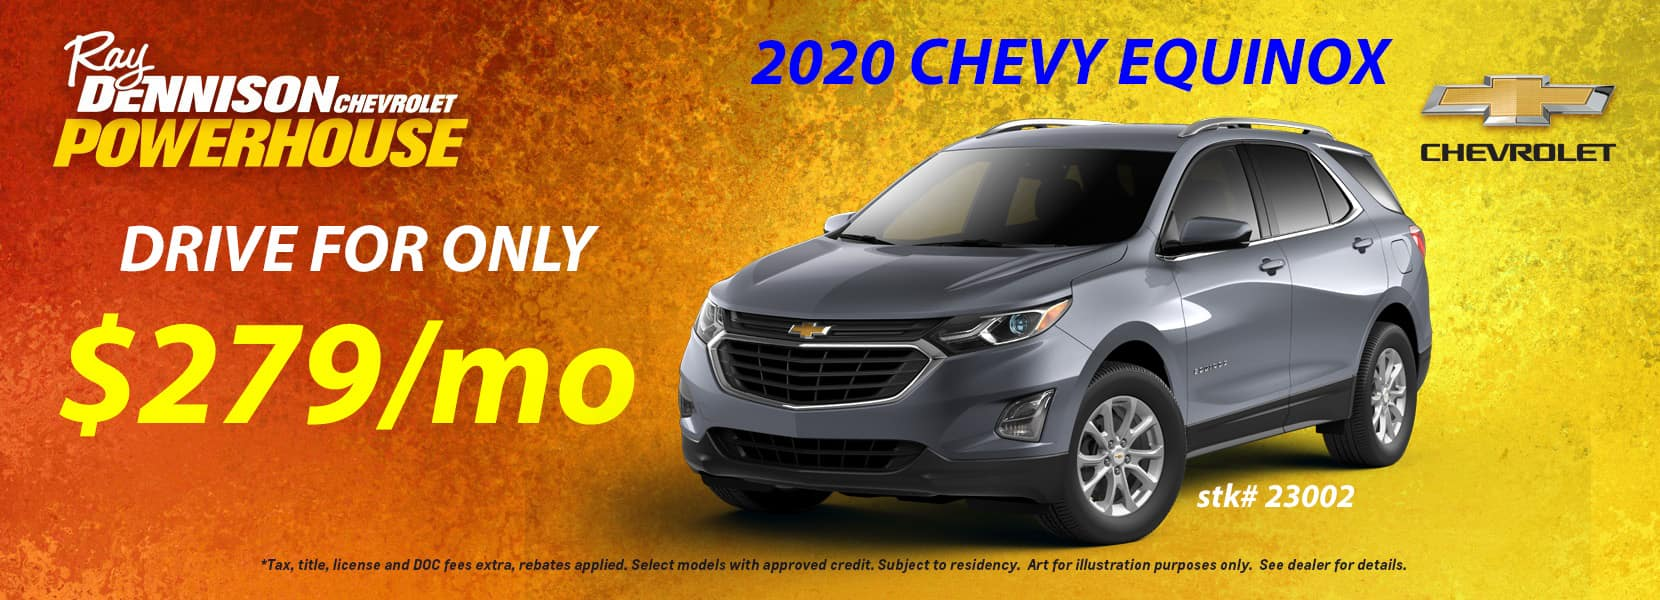 Ray Dennison Chevrolet | Chevrolet Dealer in Pekin, IL